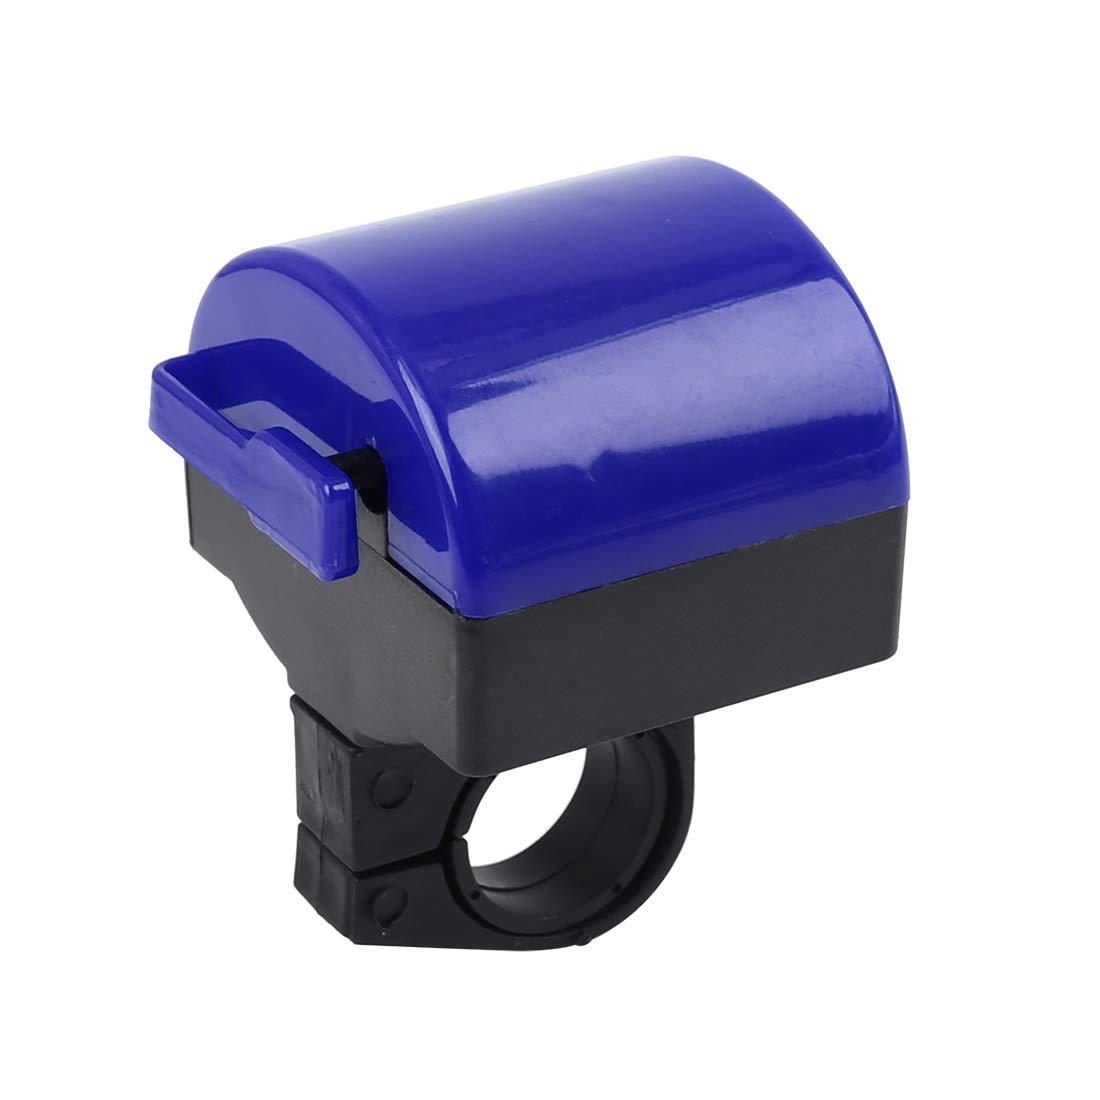 Bike Bell Cycling Handlebar Alarm Bicycle Ring Loud Speaker Horn Siren Blue